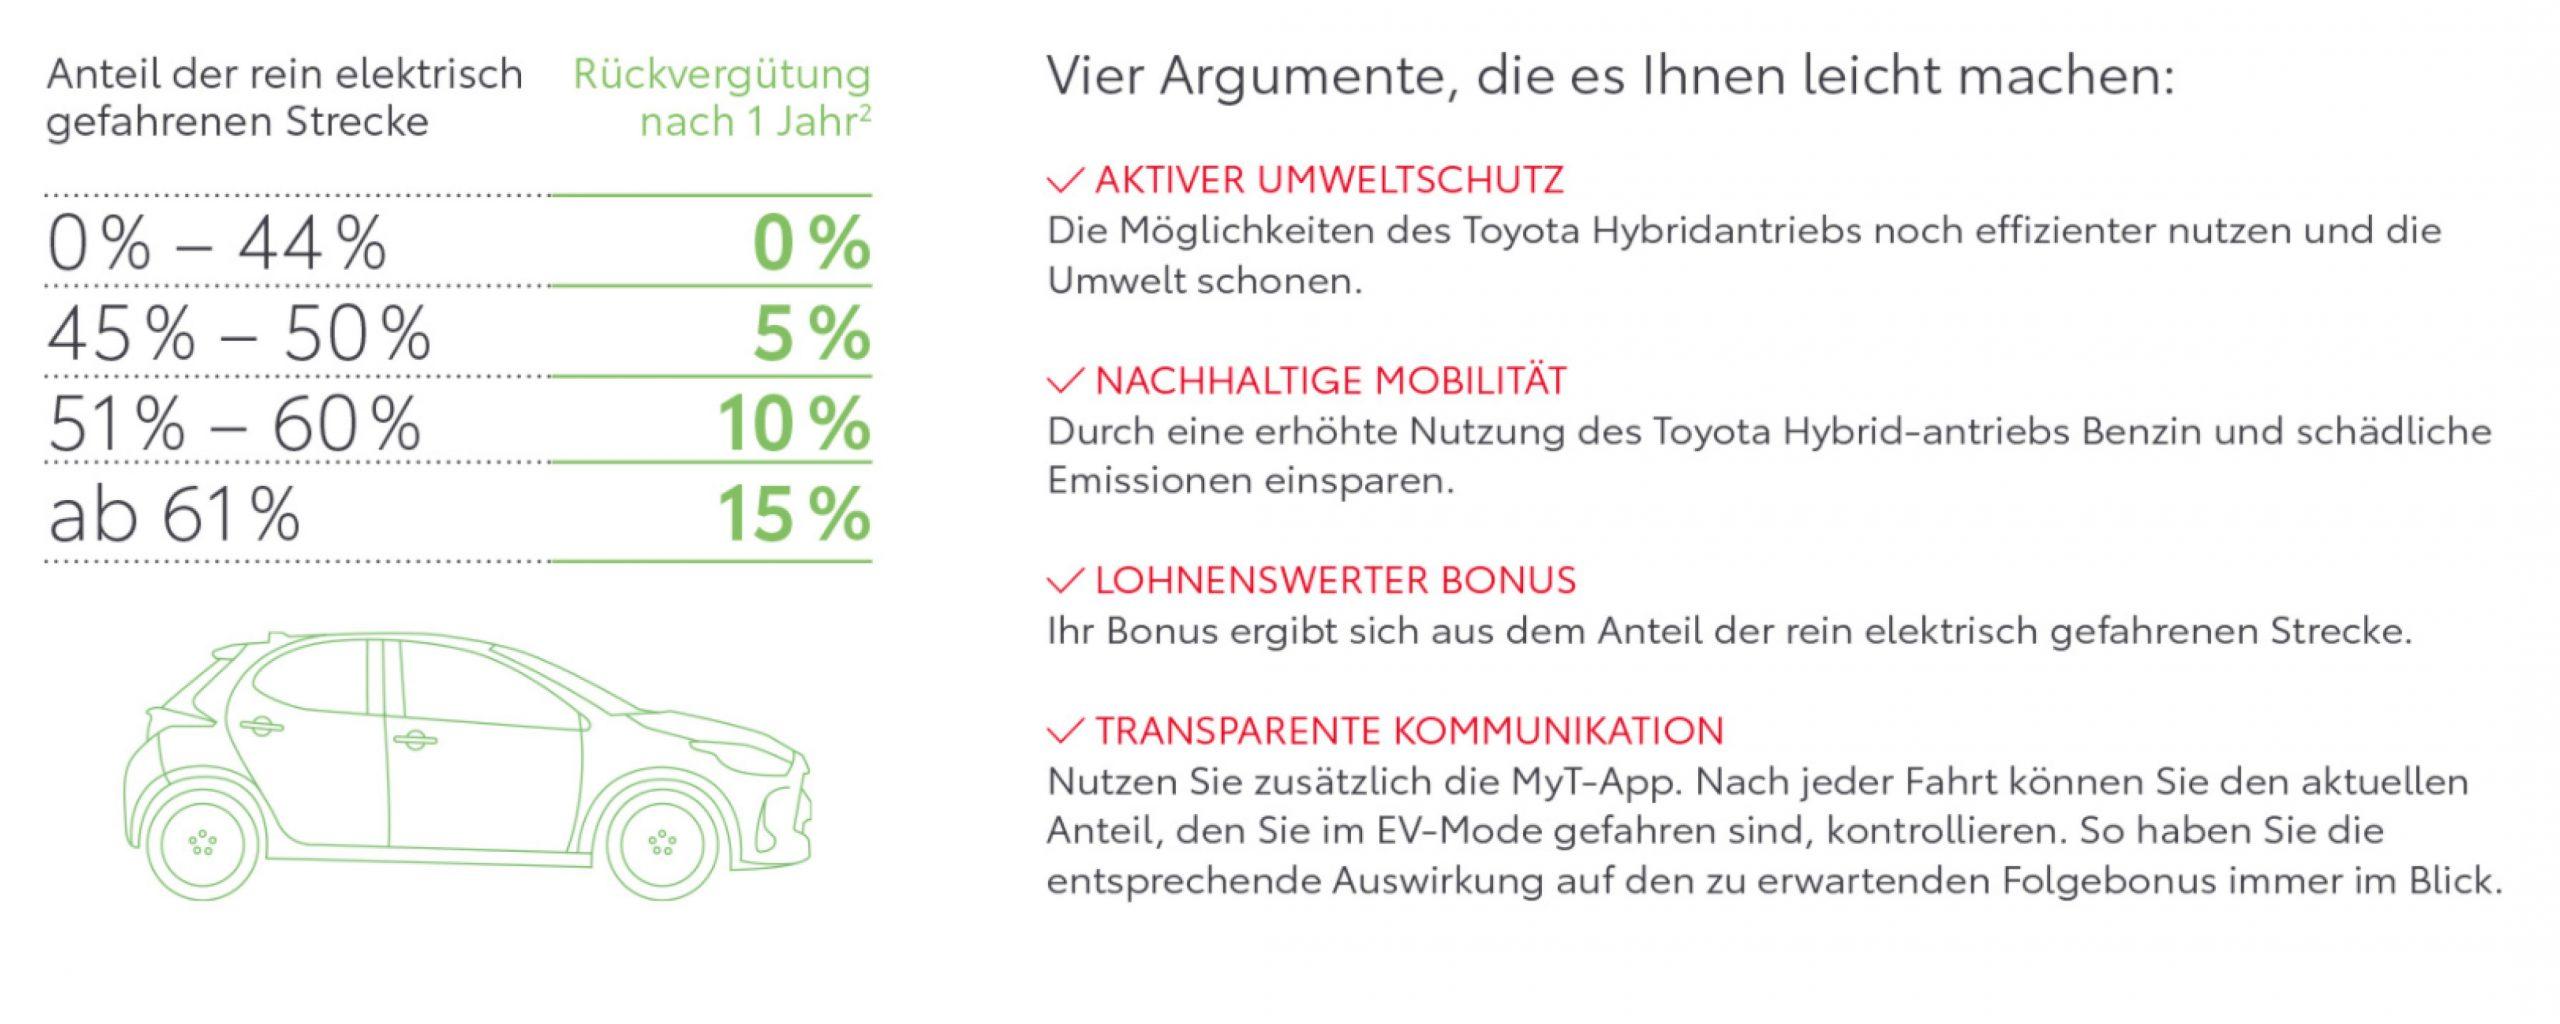 Hybridversicherung_Rückvergütung